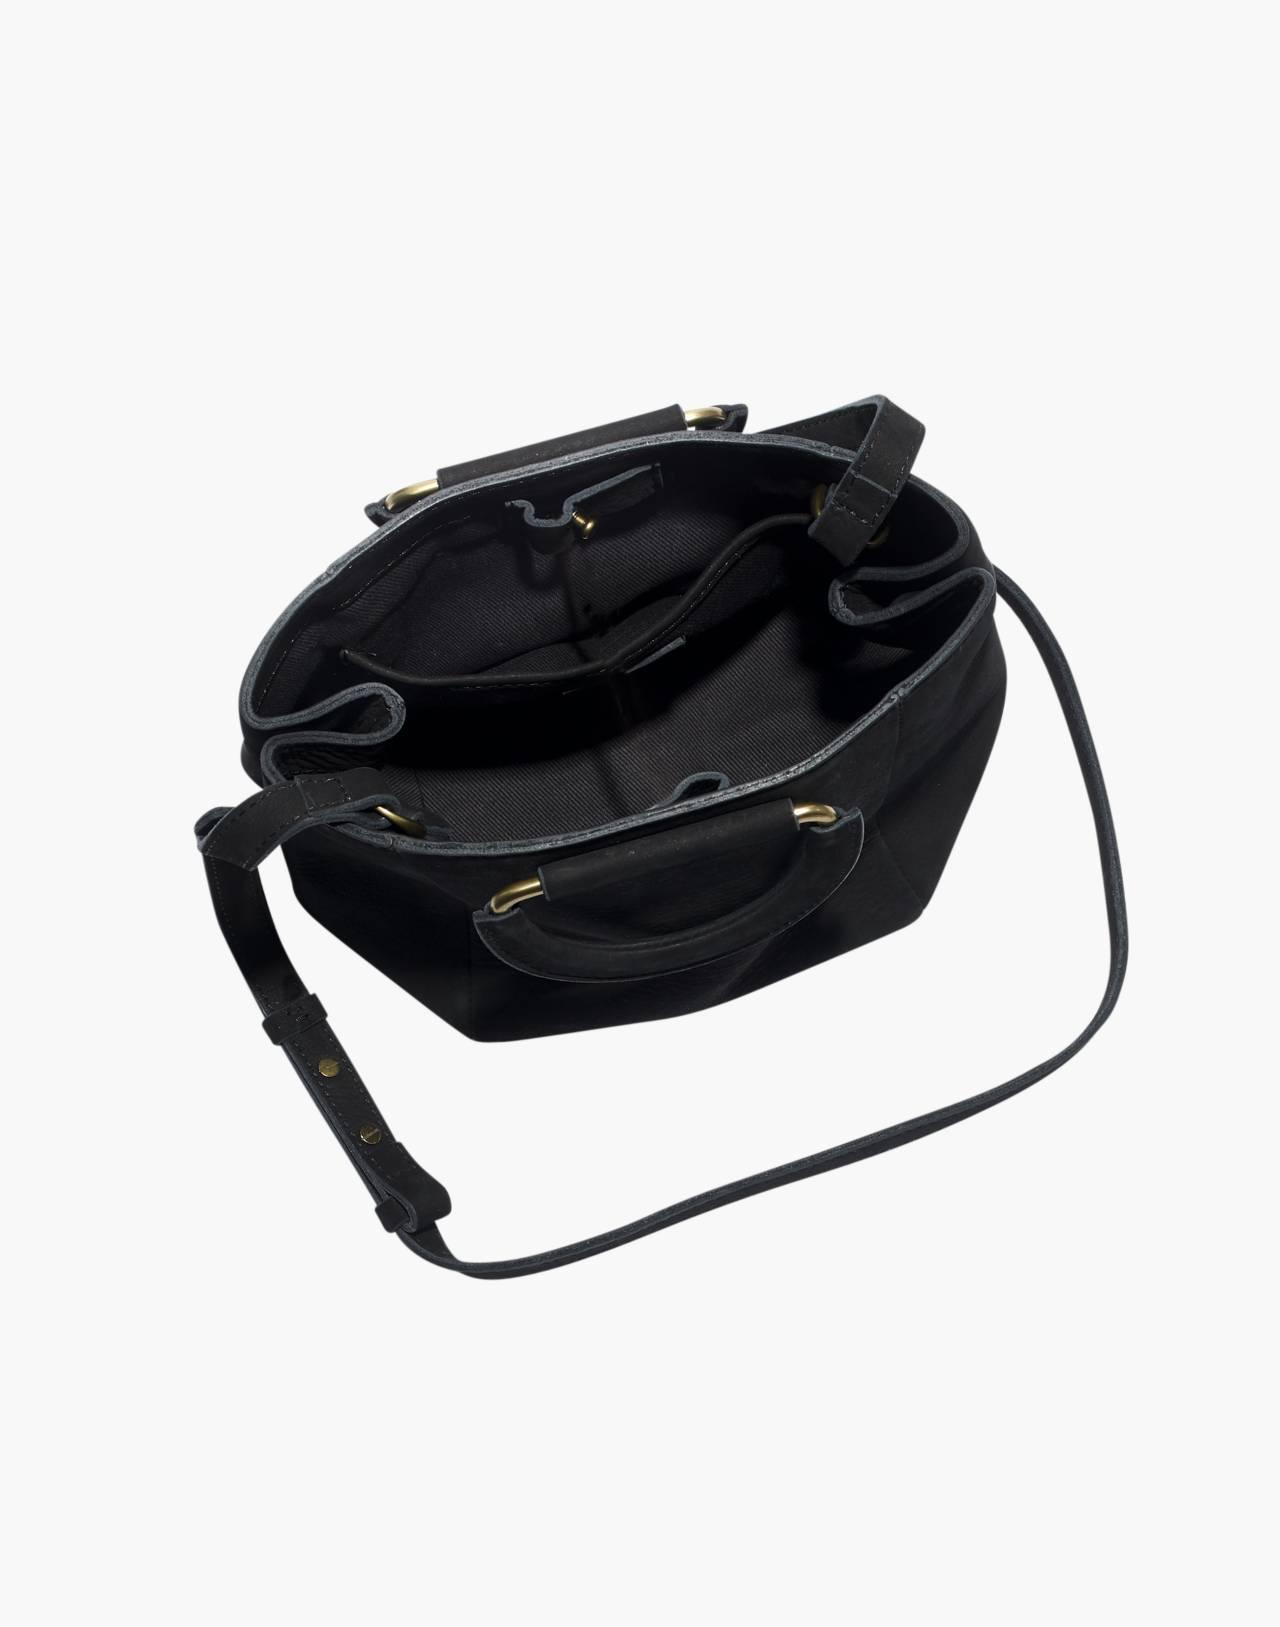 The Top-Handle Mini Bag in true black image 3